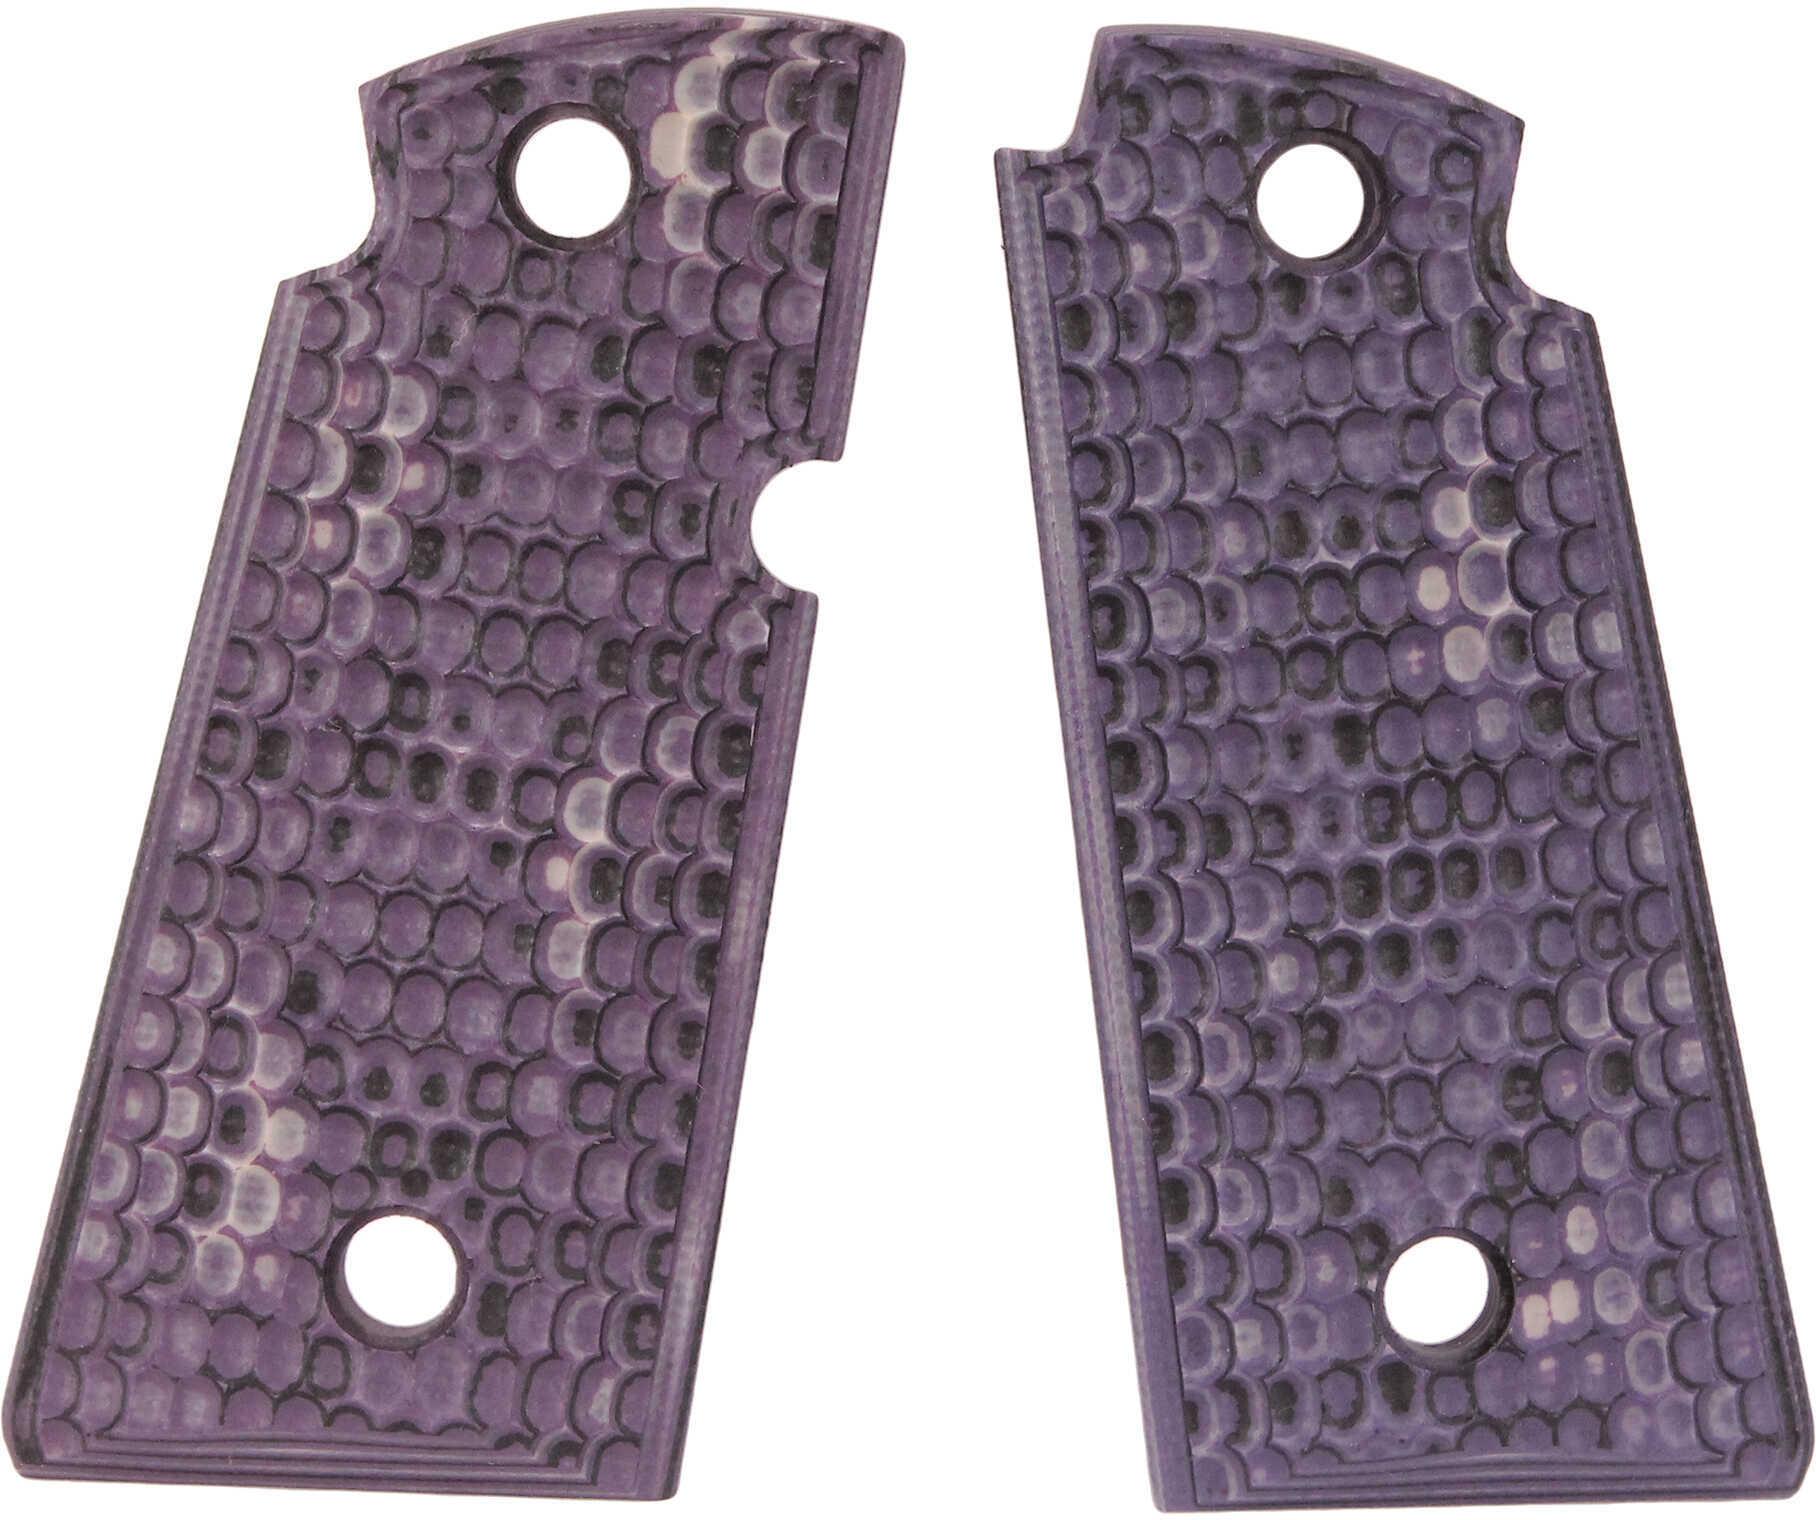 Hogue Kimber Micro .380 Ambidextrous Piranha G10 - G-Mascus Purple Lava